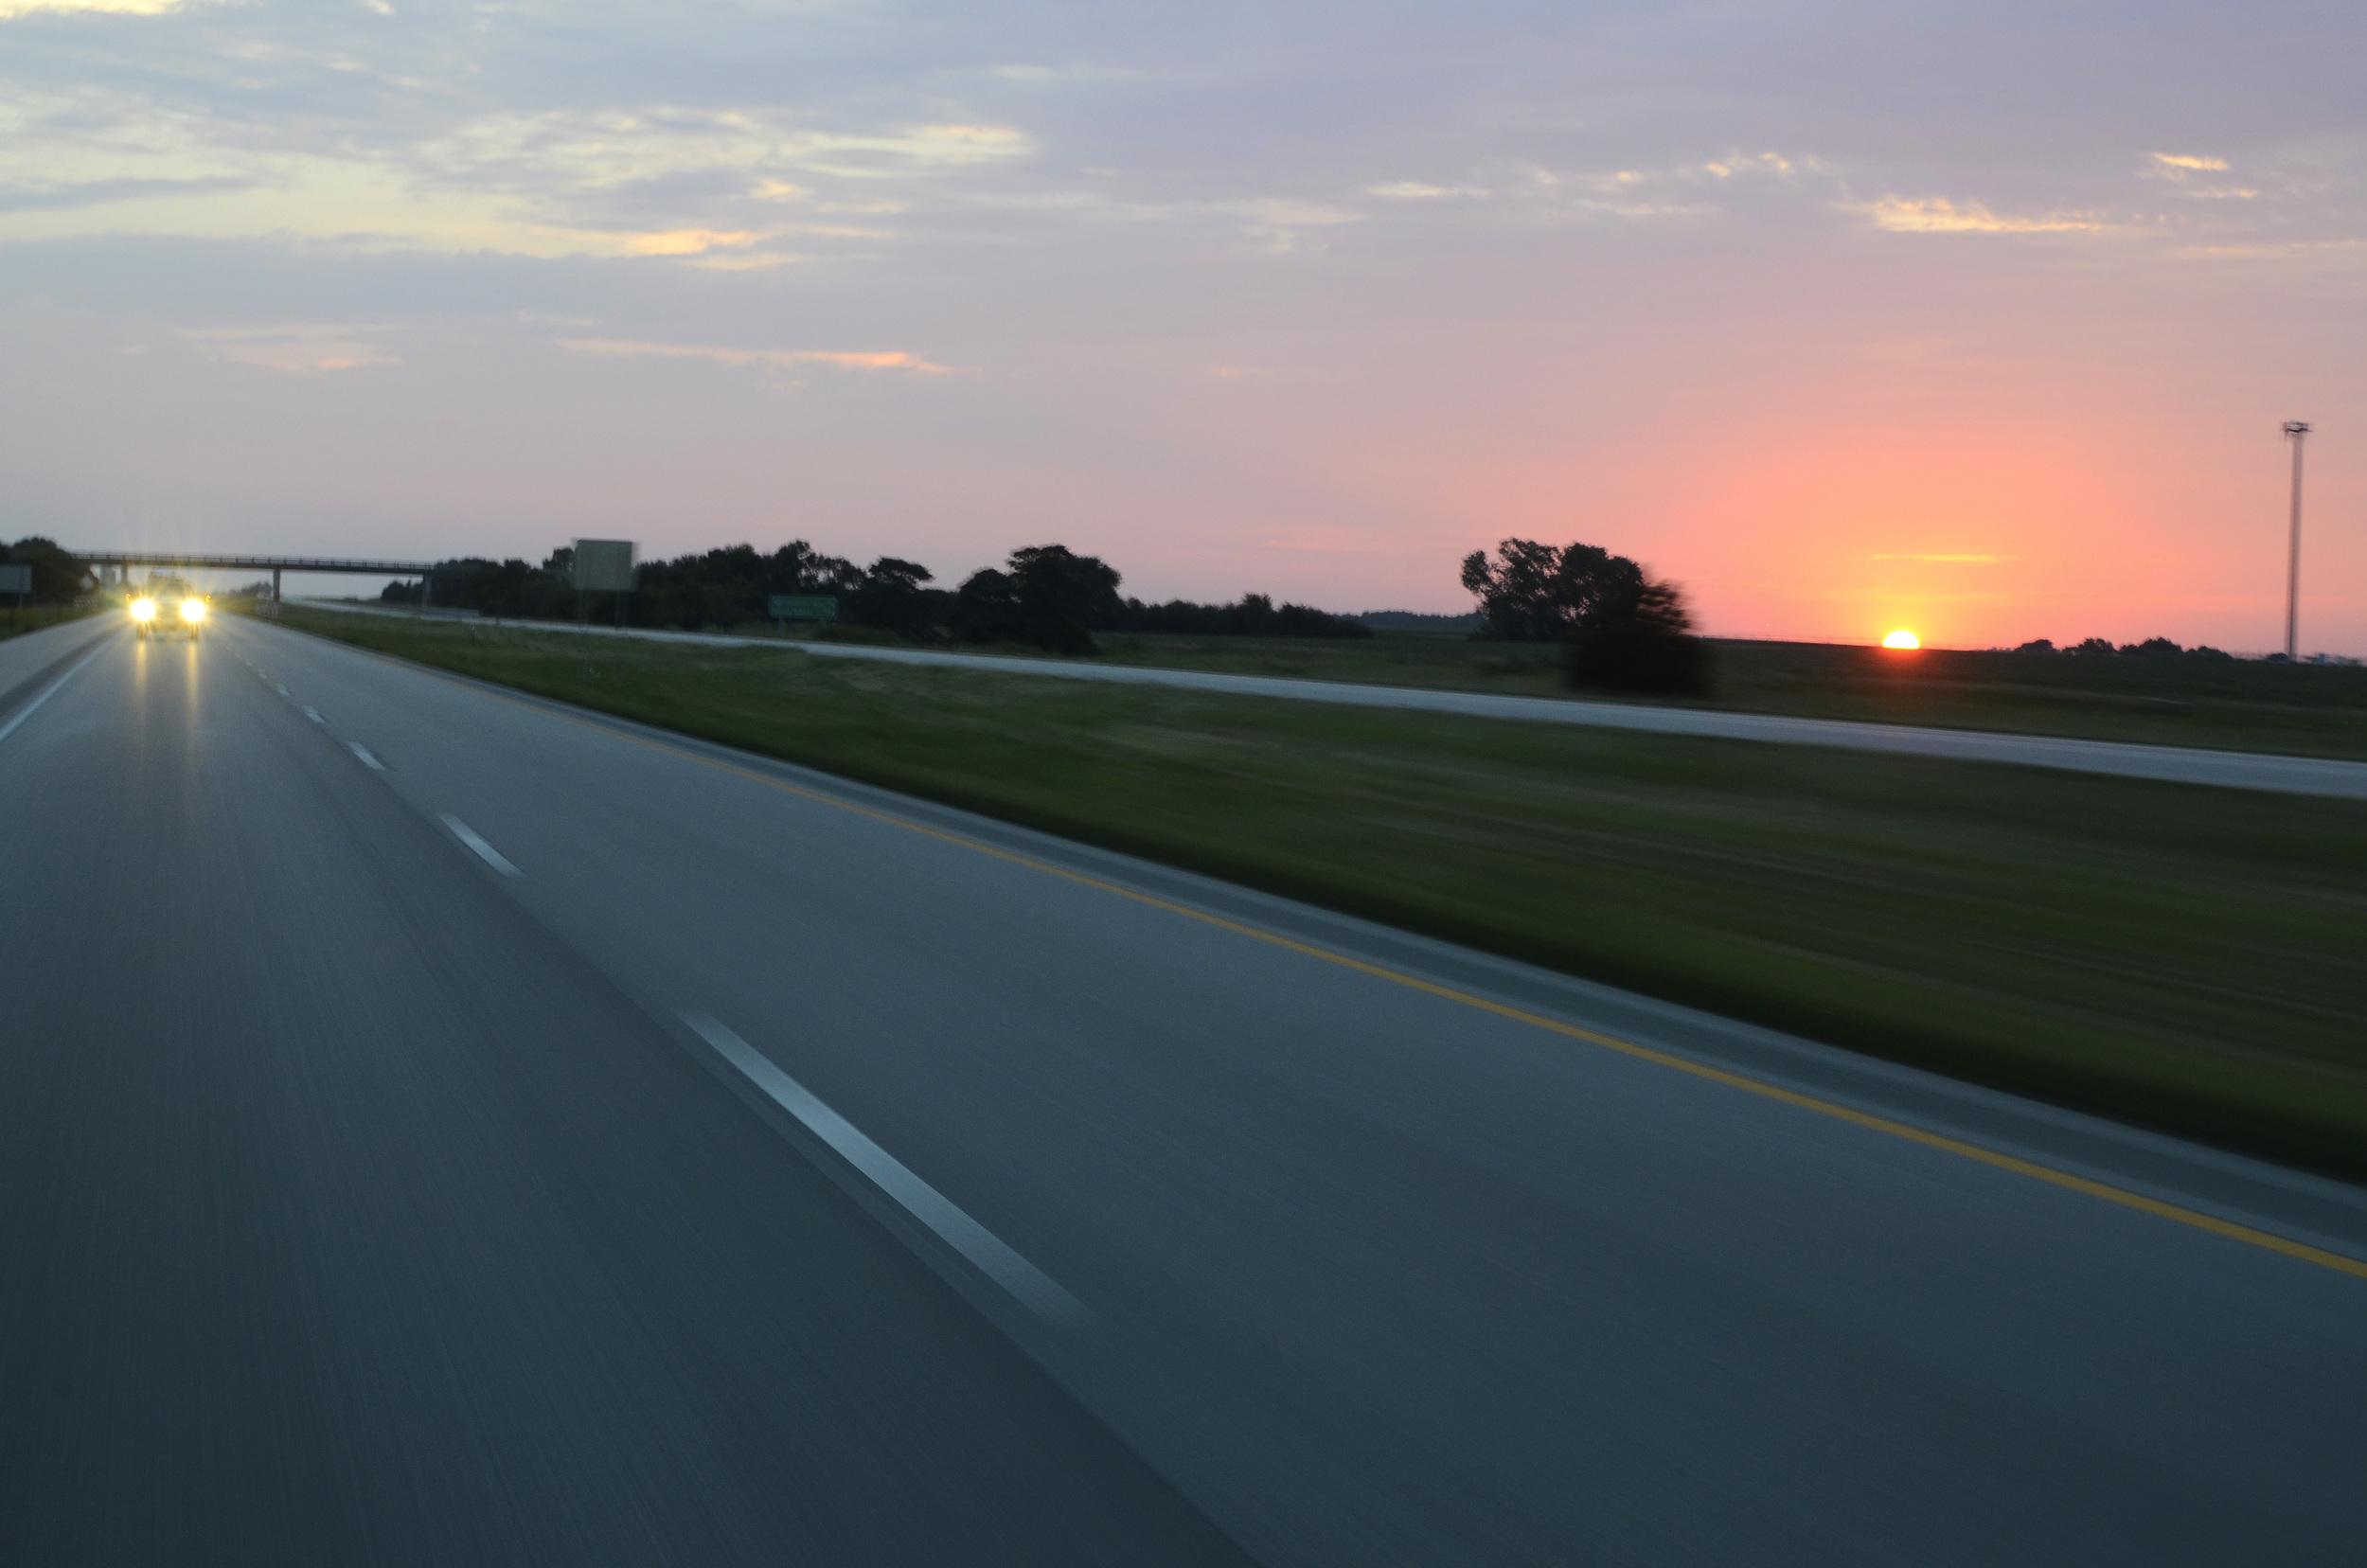 011 80 MPH Sunset - Omaha.jpg